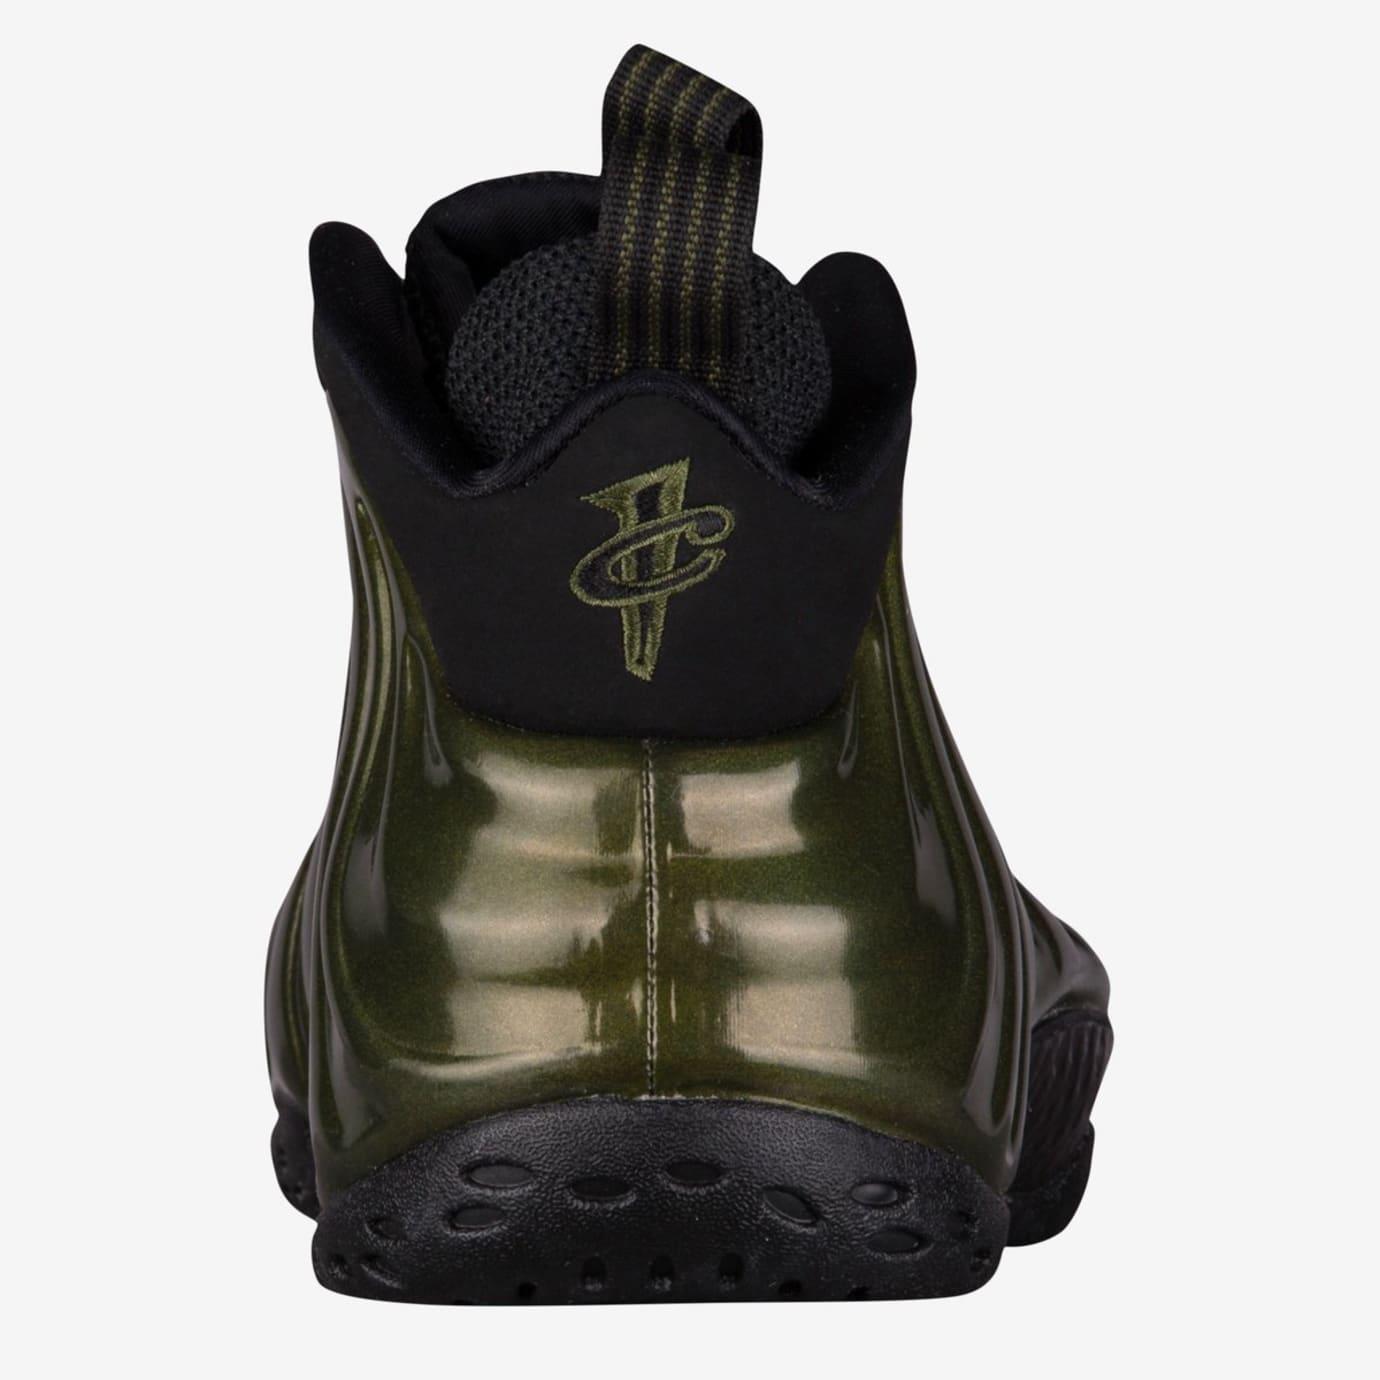 Nike Air Foamposite One 'Legion Green' 314996-301 (Heel)